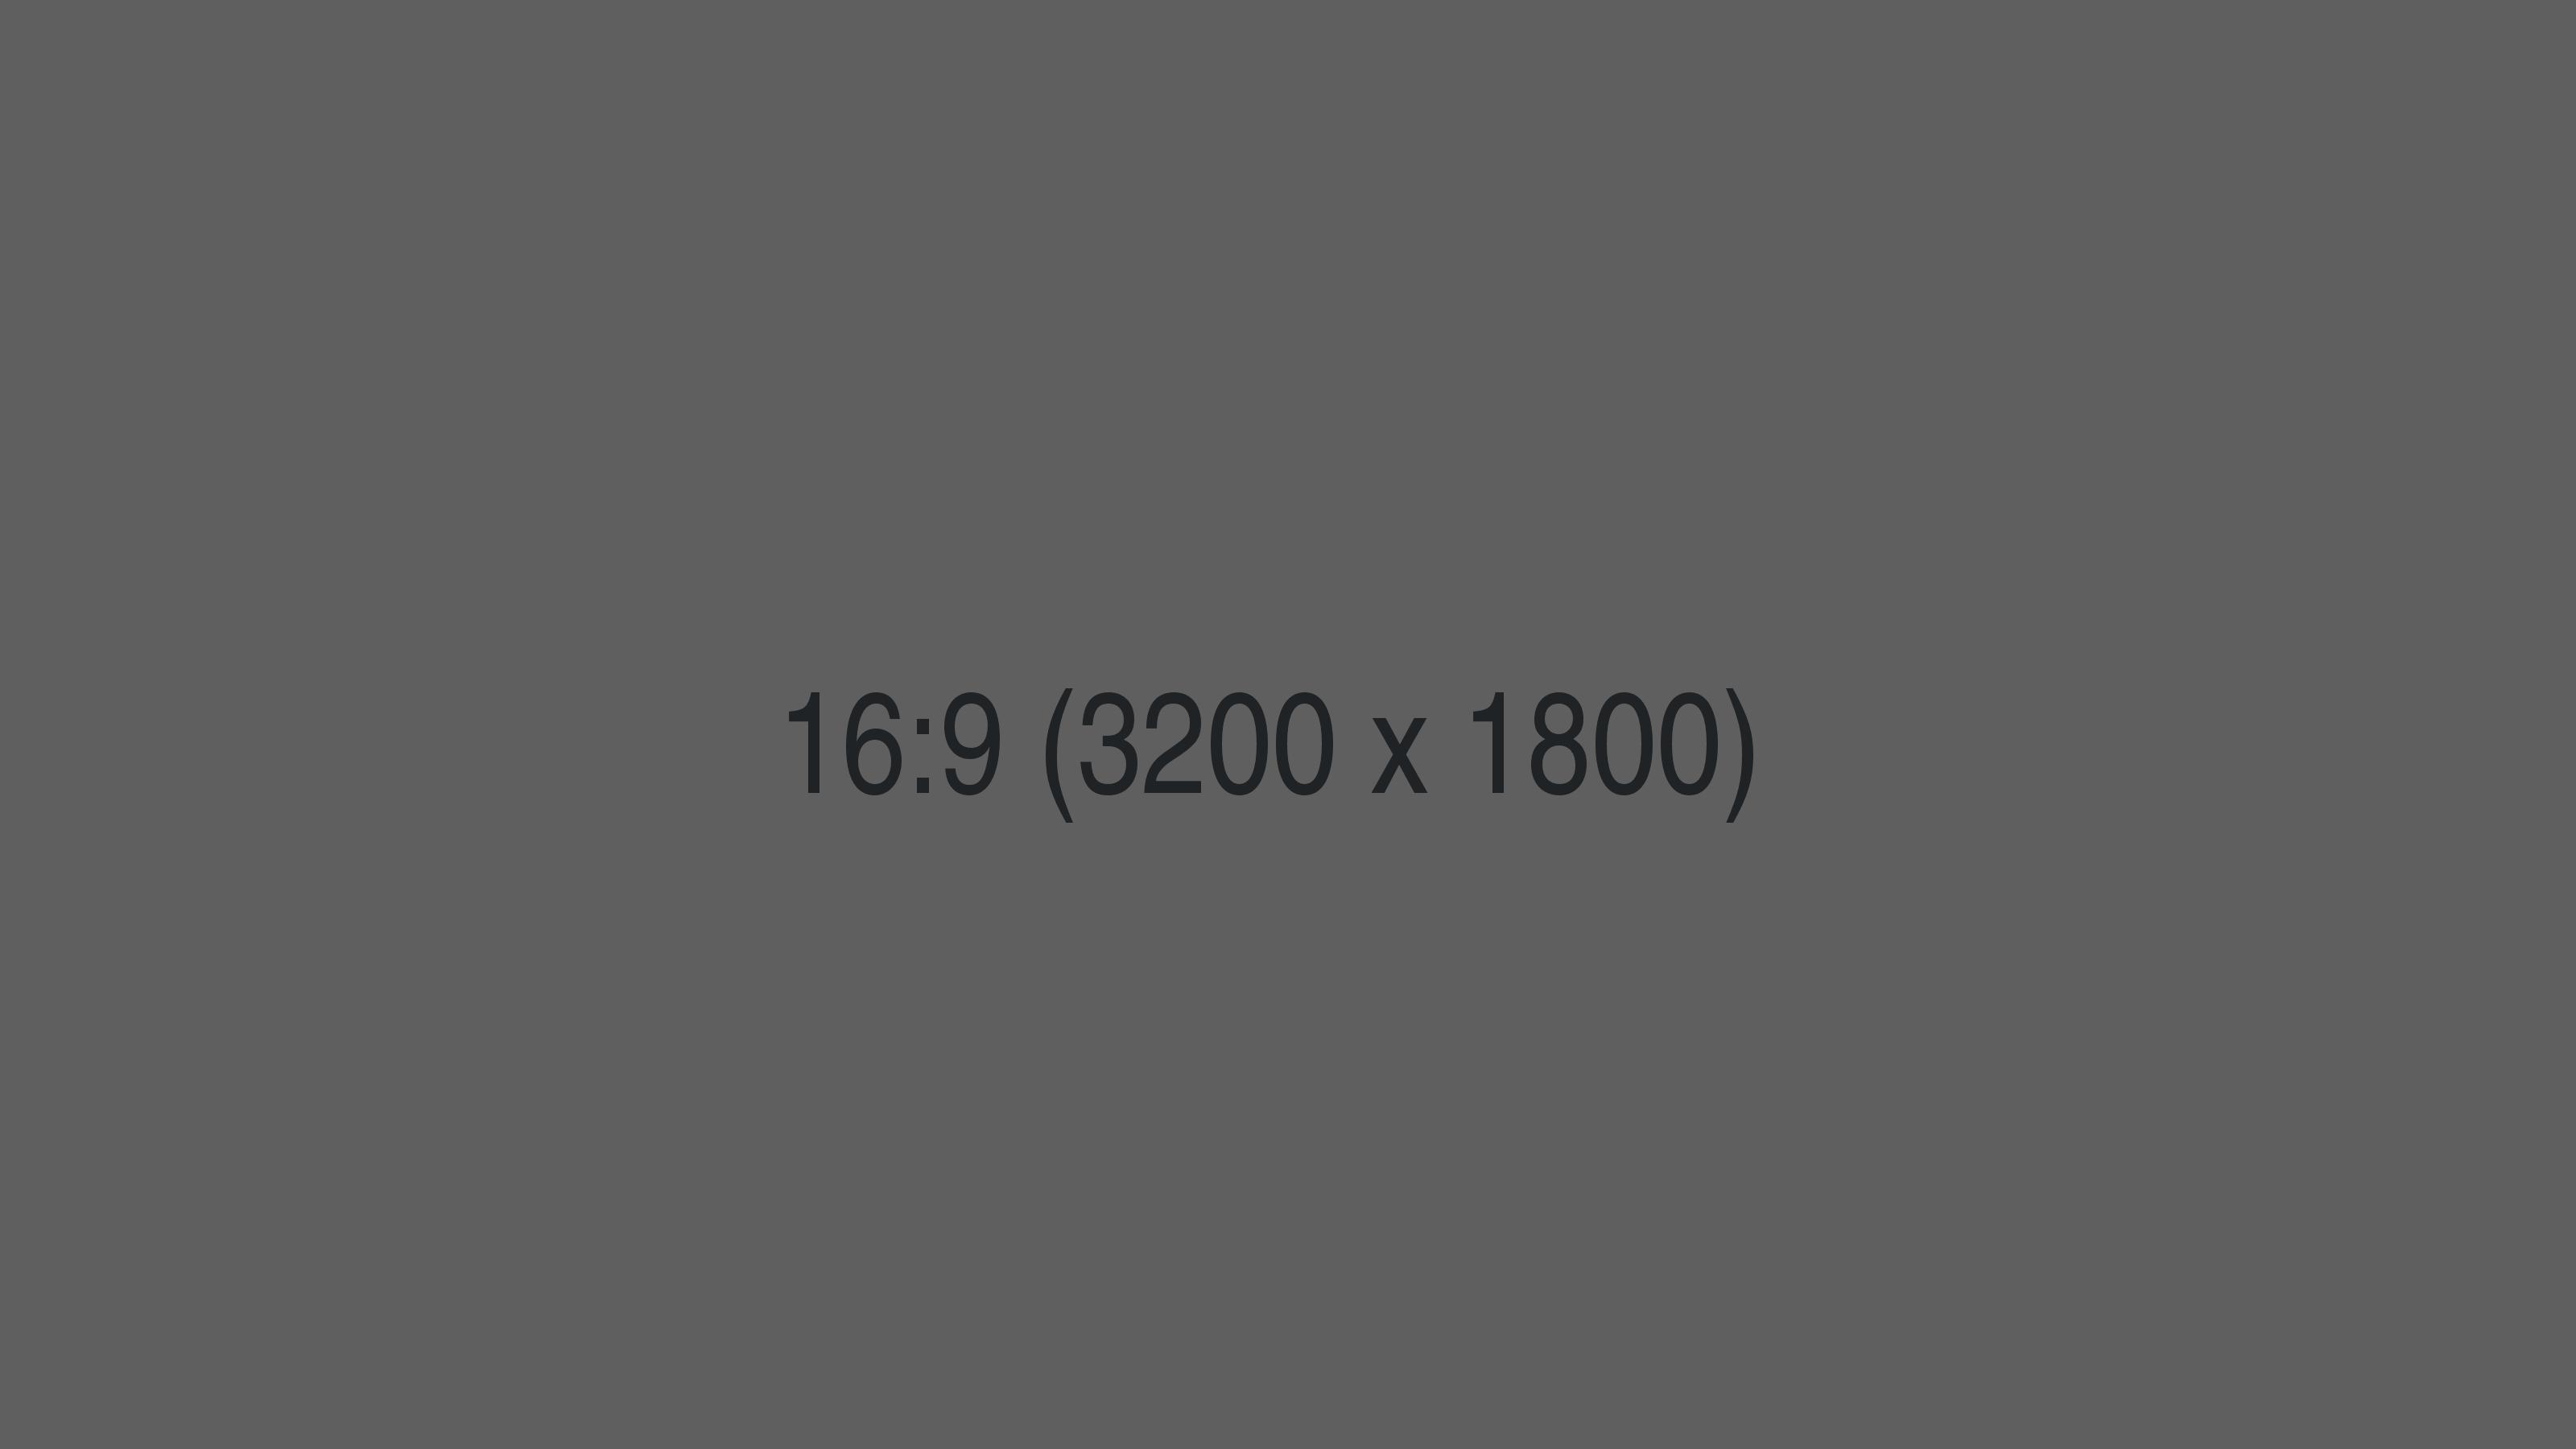 16_9___3200x1800___grey.png